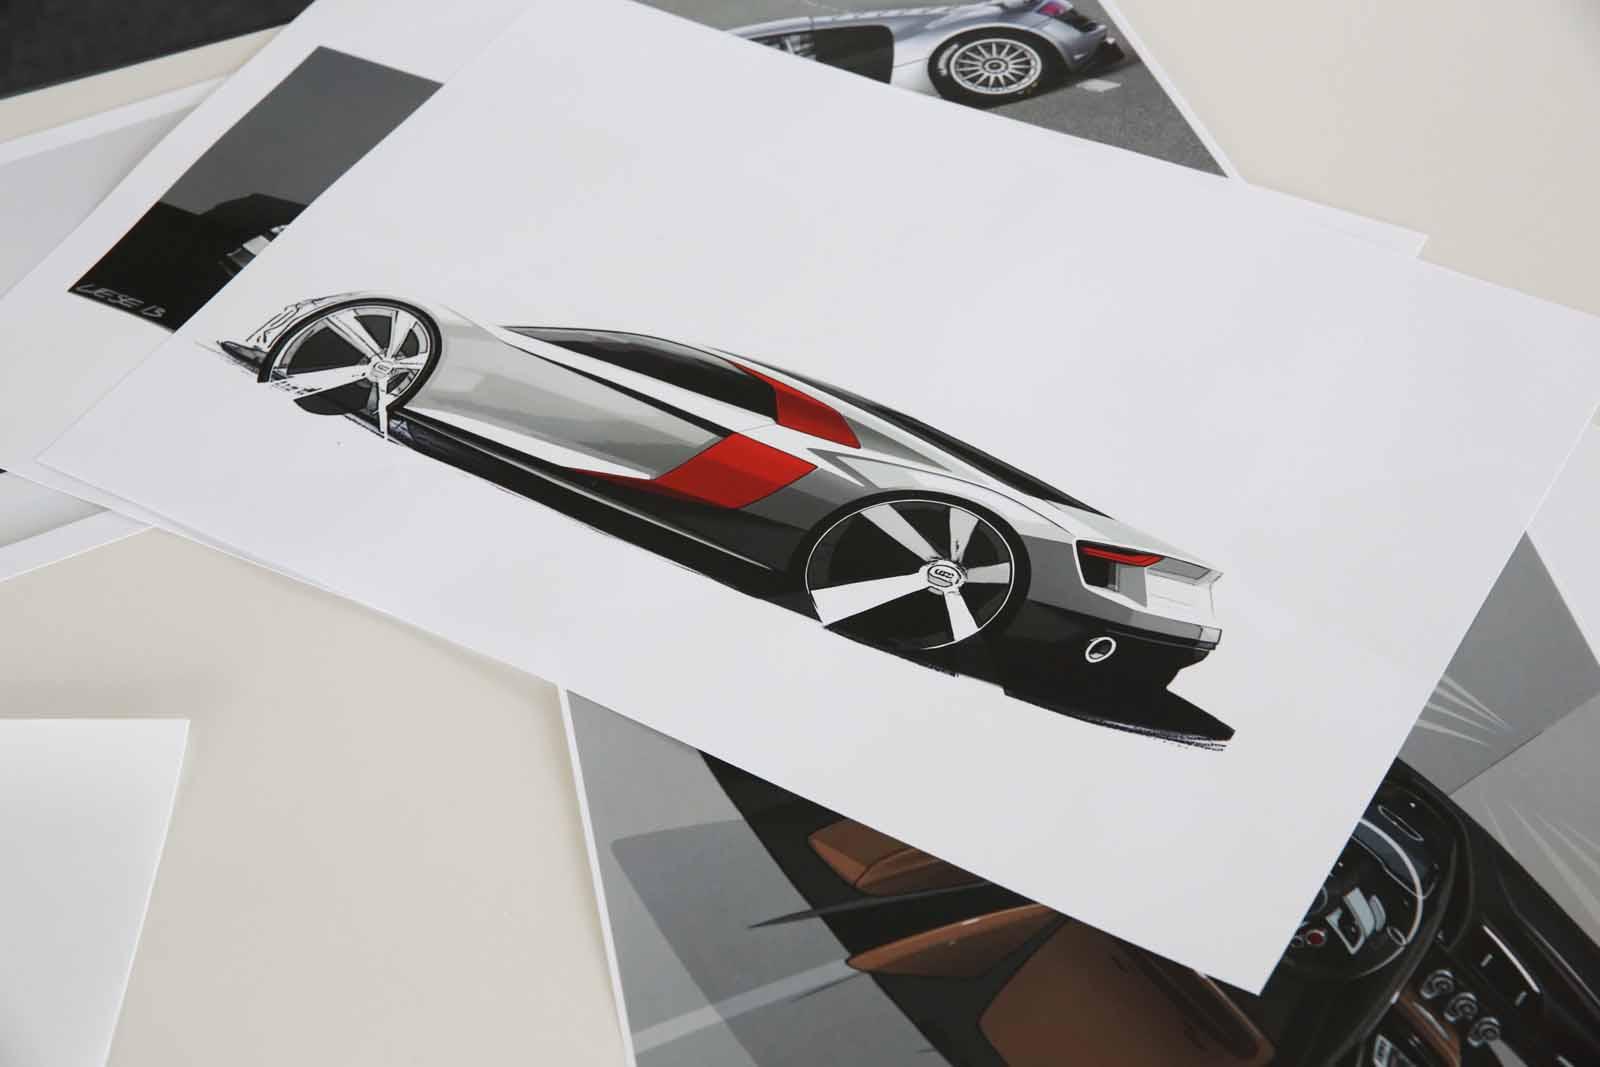 Audi-quattro-e-tron-concept-Forum-Neckarsulm-311